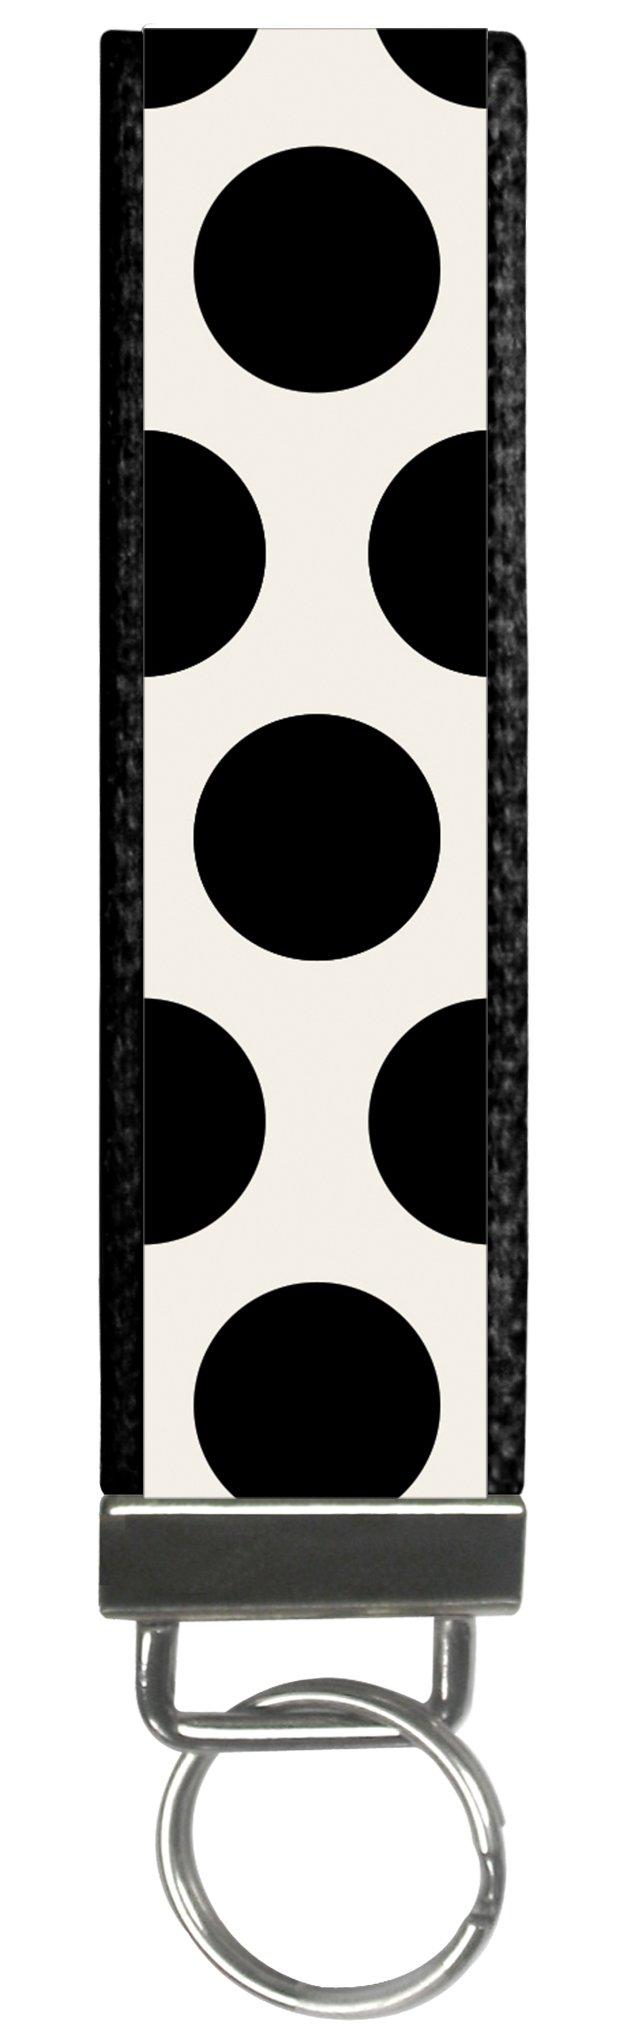 Trendy Polka Dot Black Design Wristlet Keyfob Keychain One Size